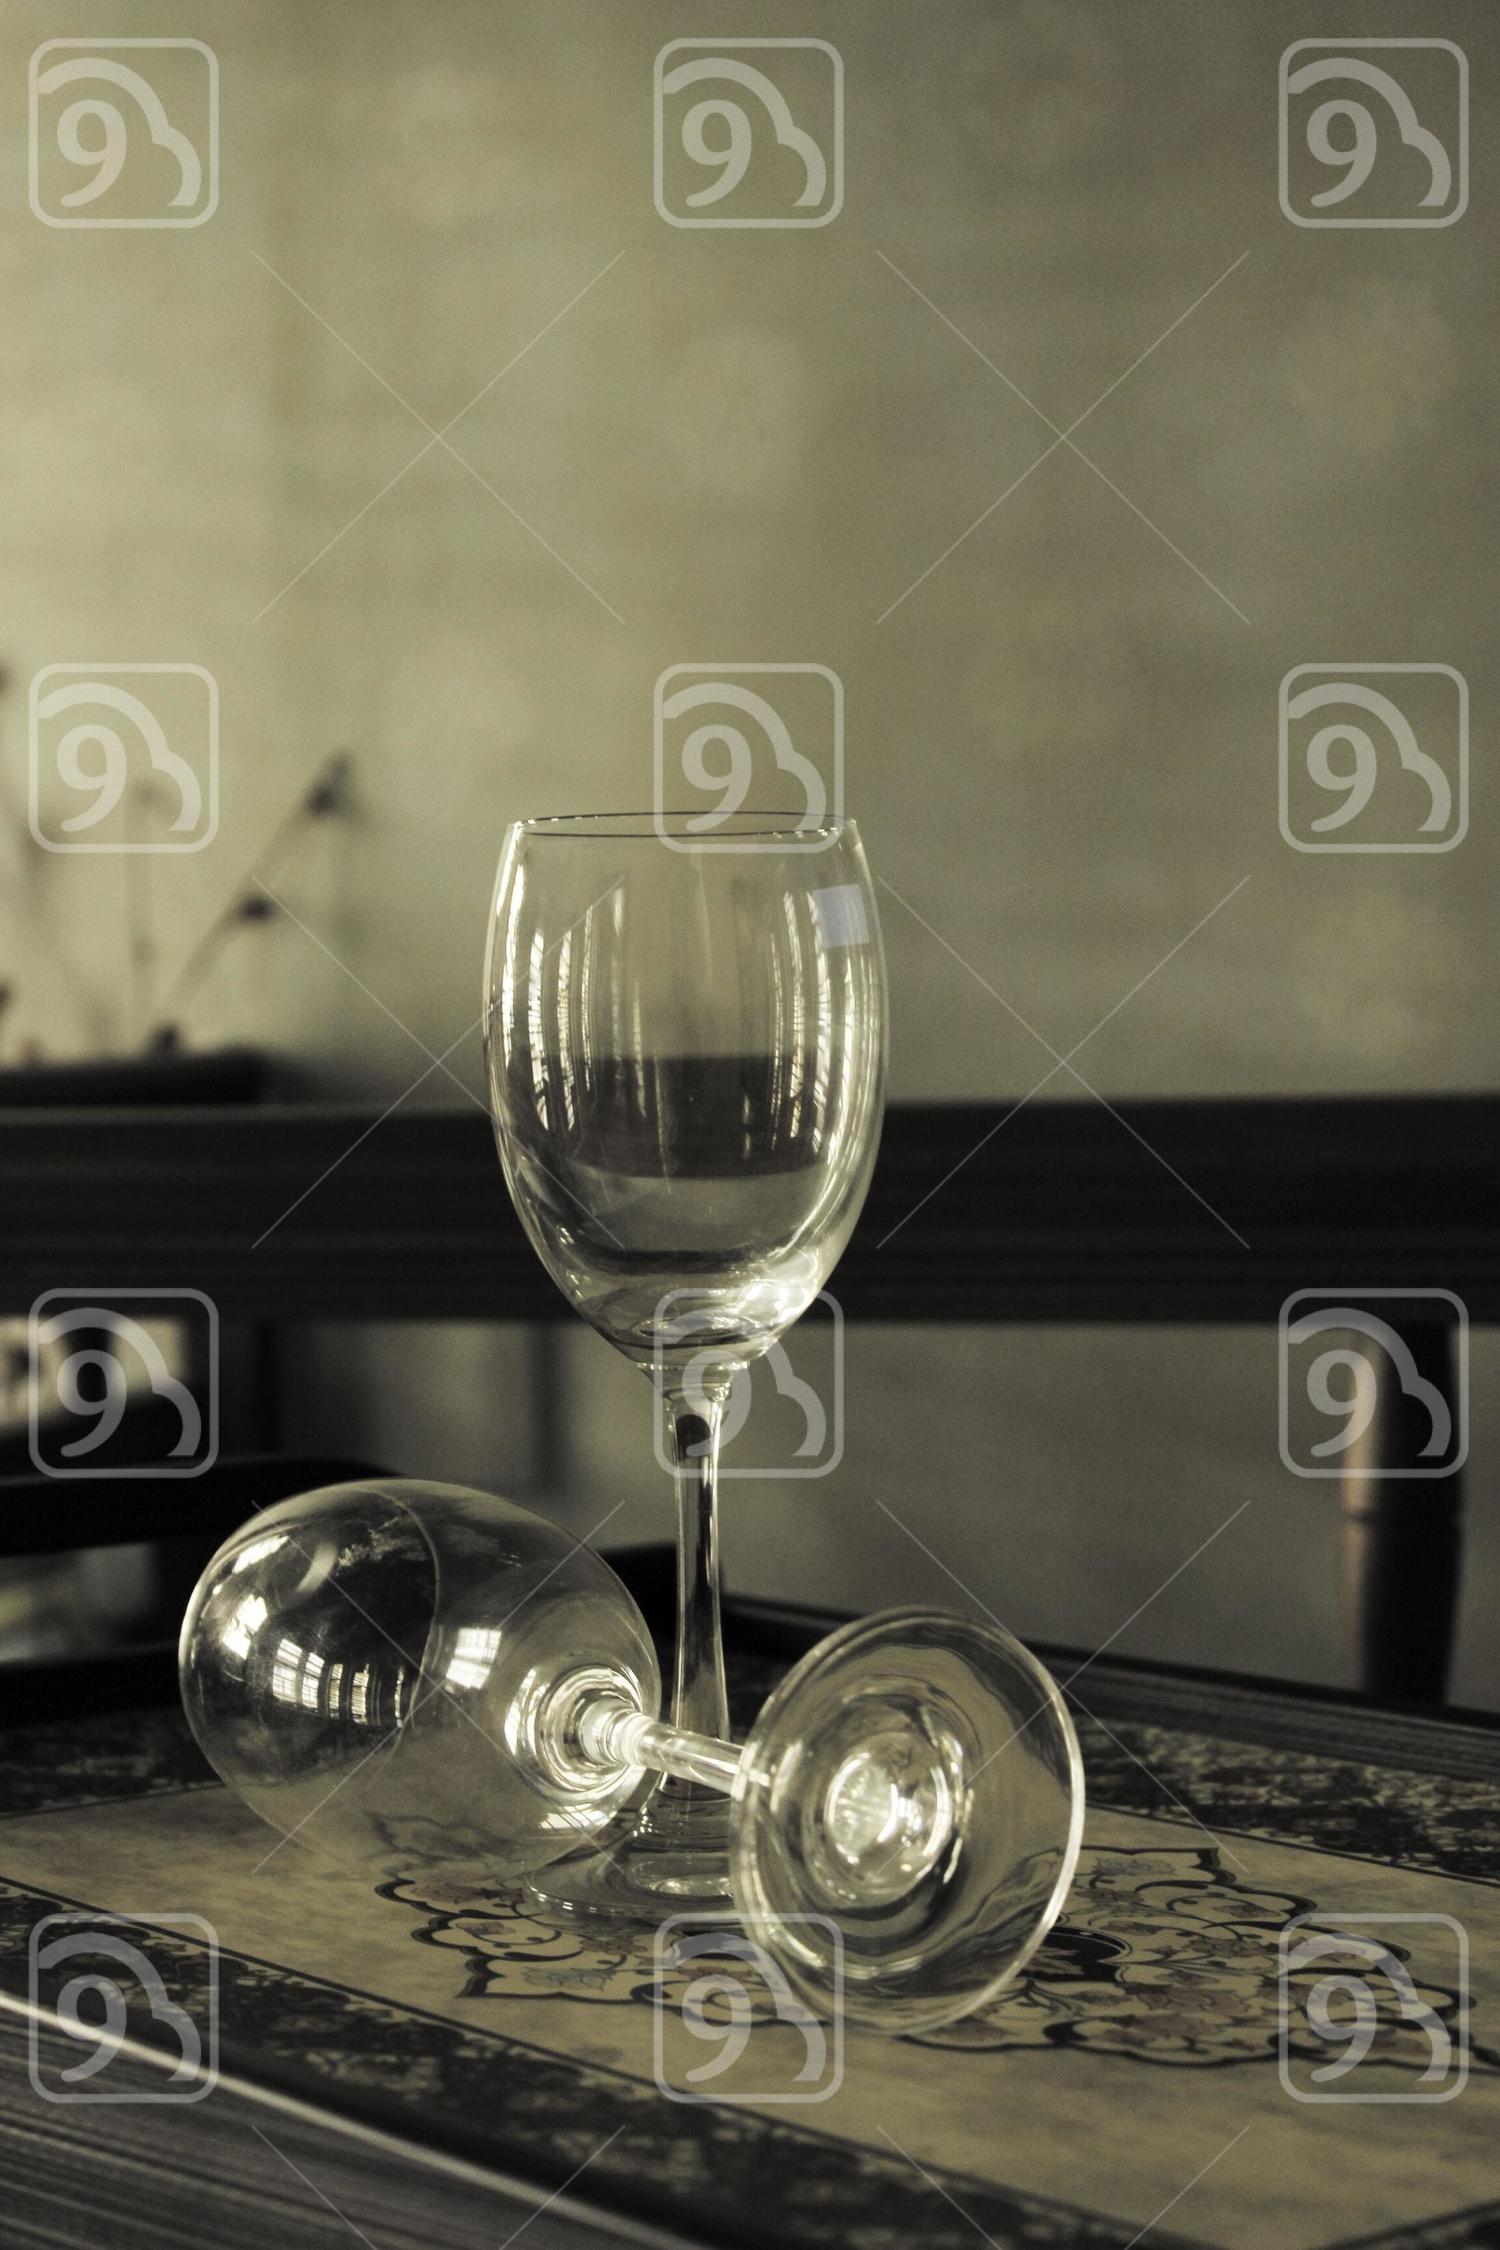 Classic Wine glass